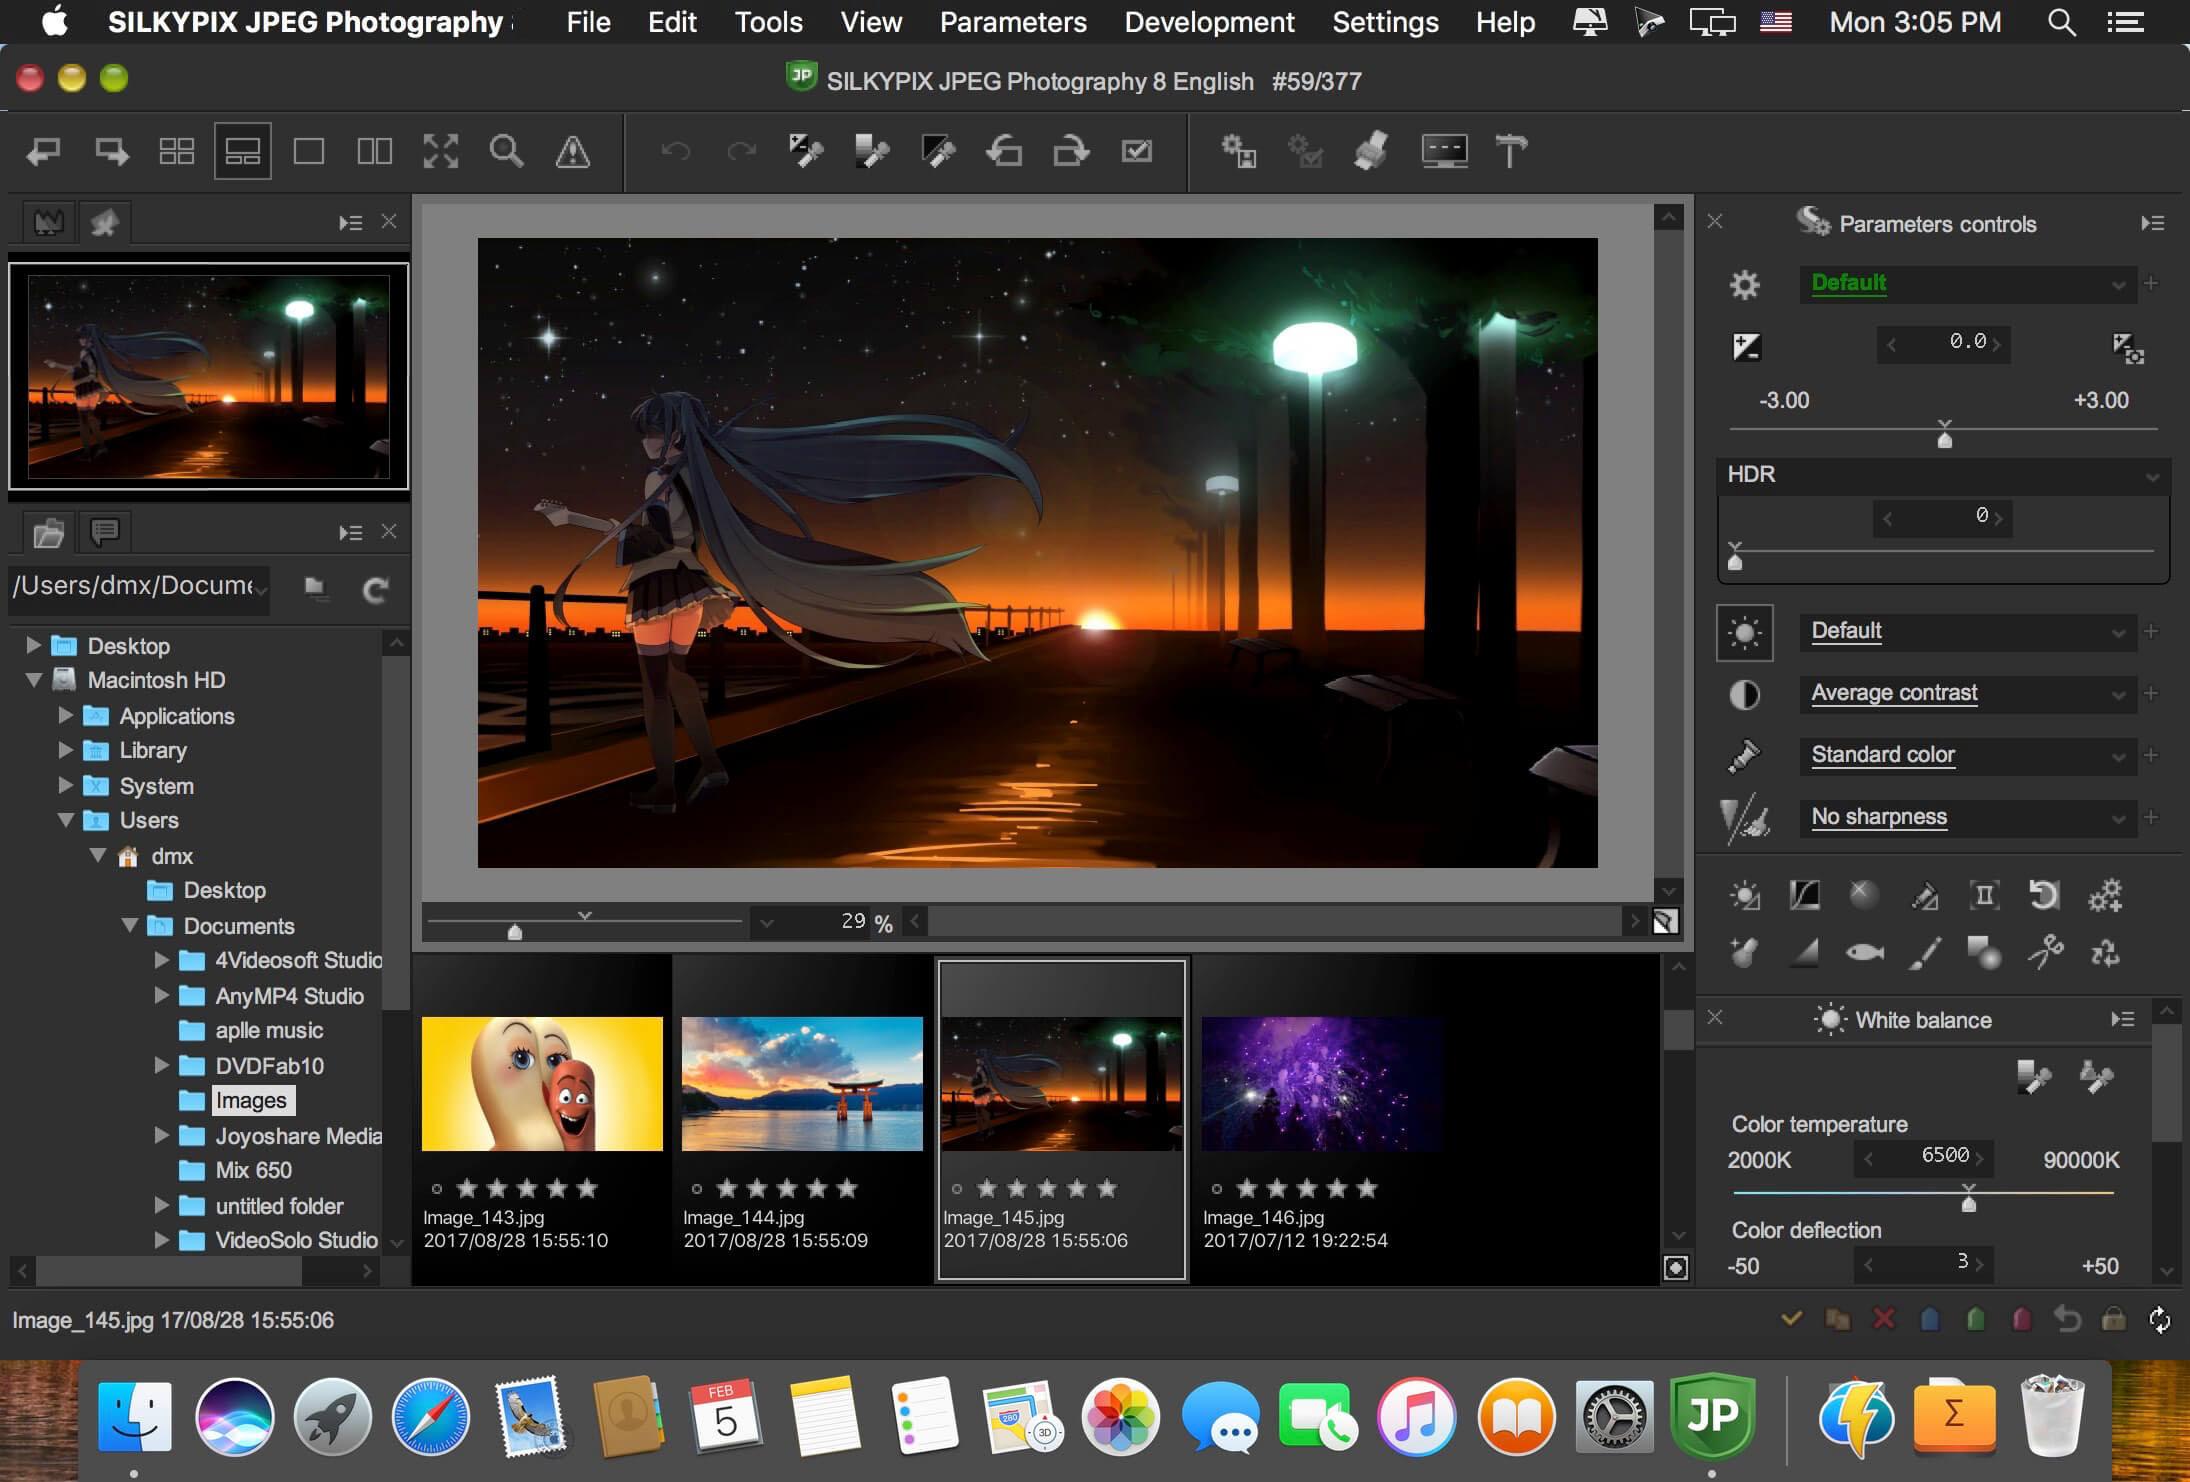 SILKYPIX JPEG Photography mac